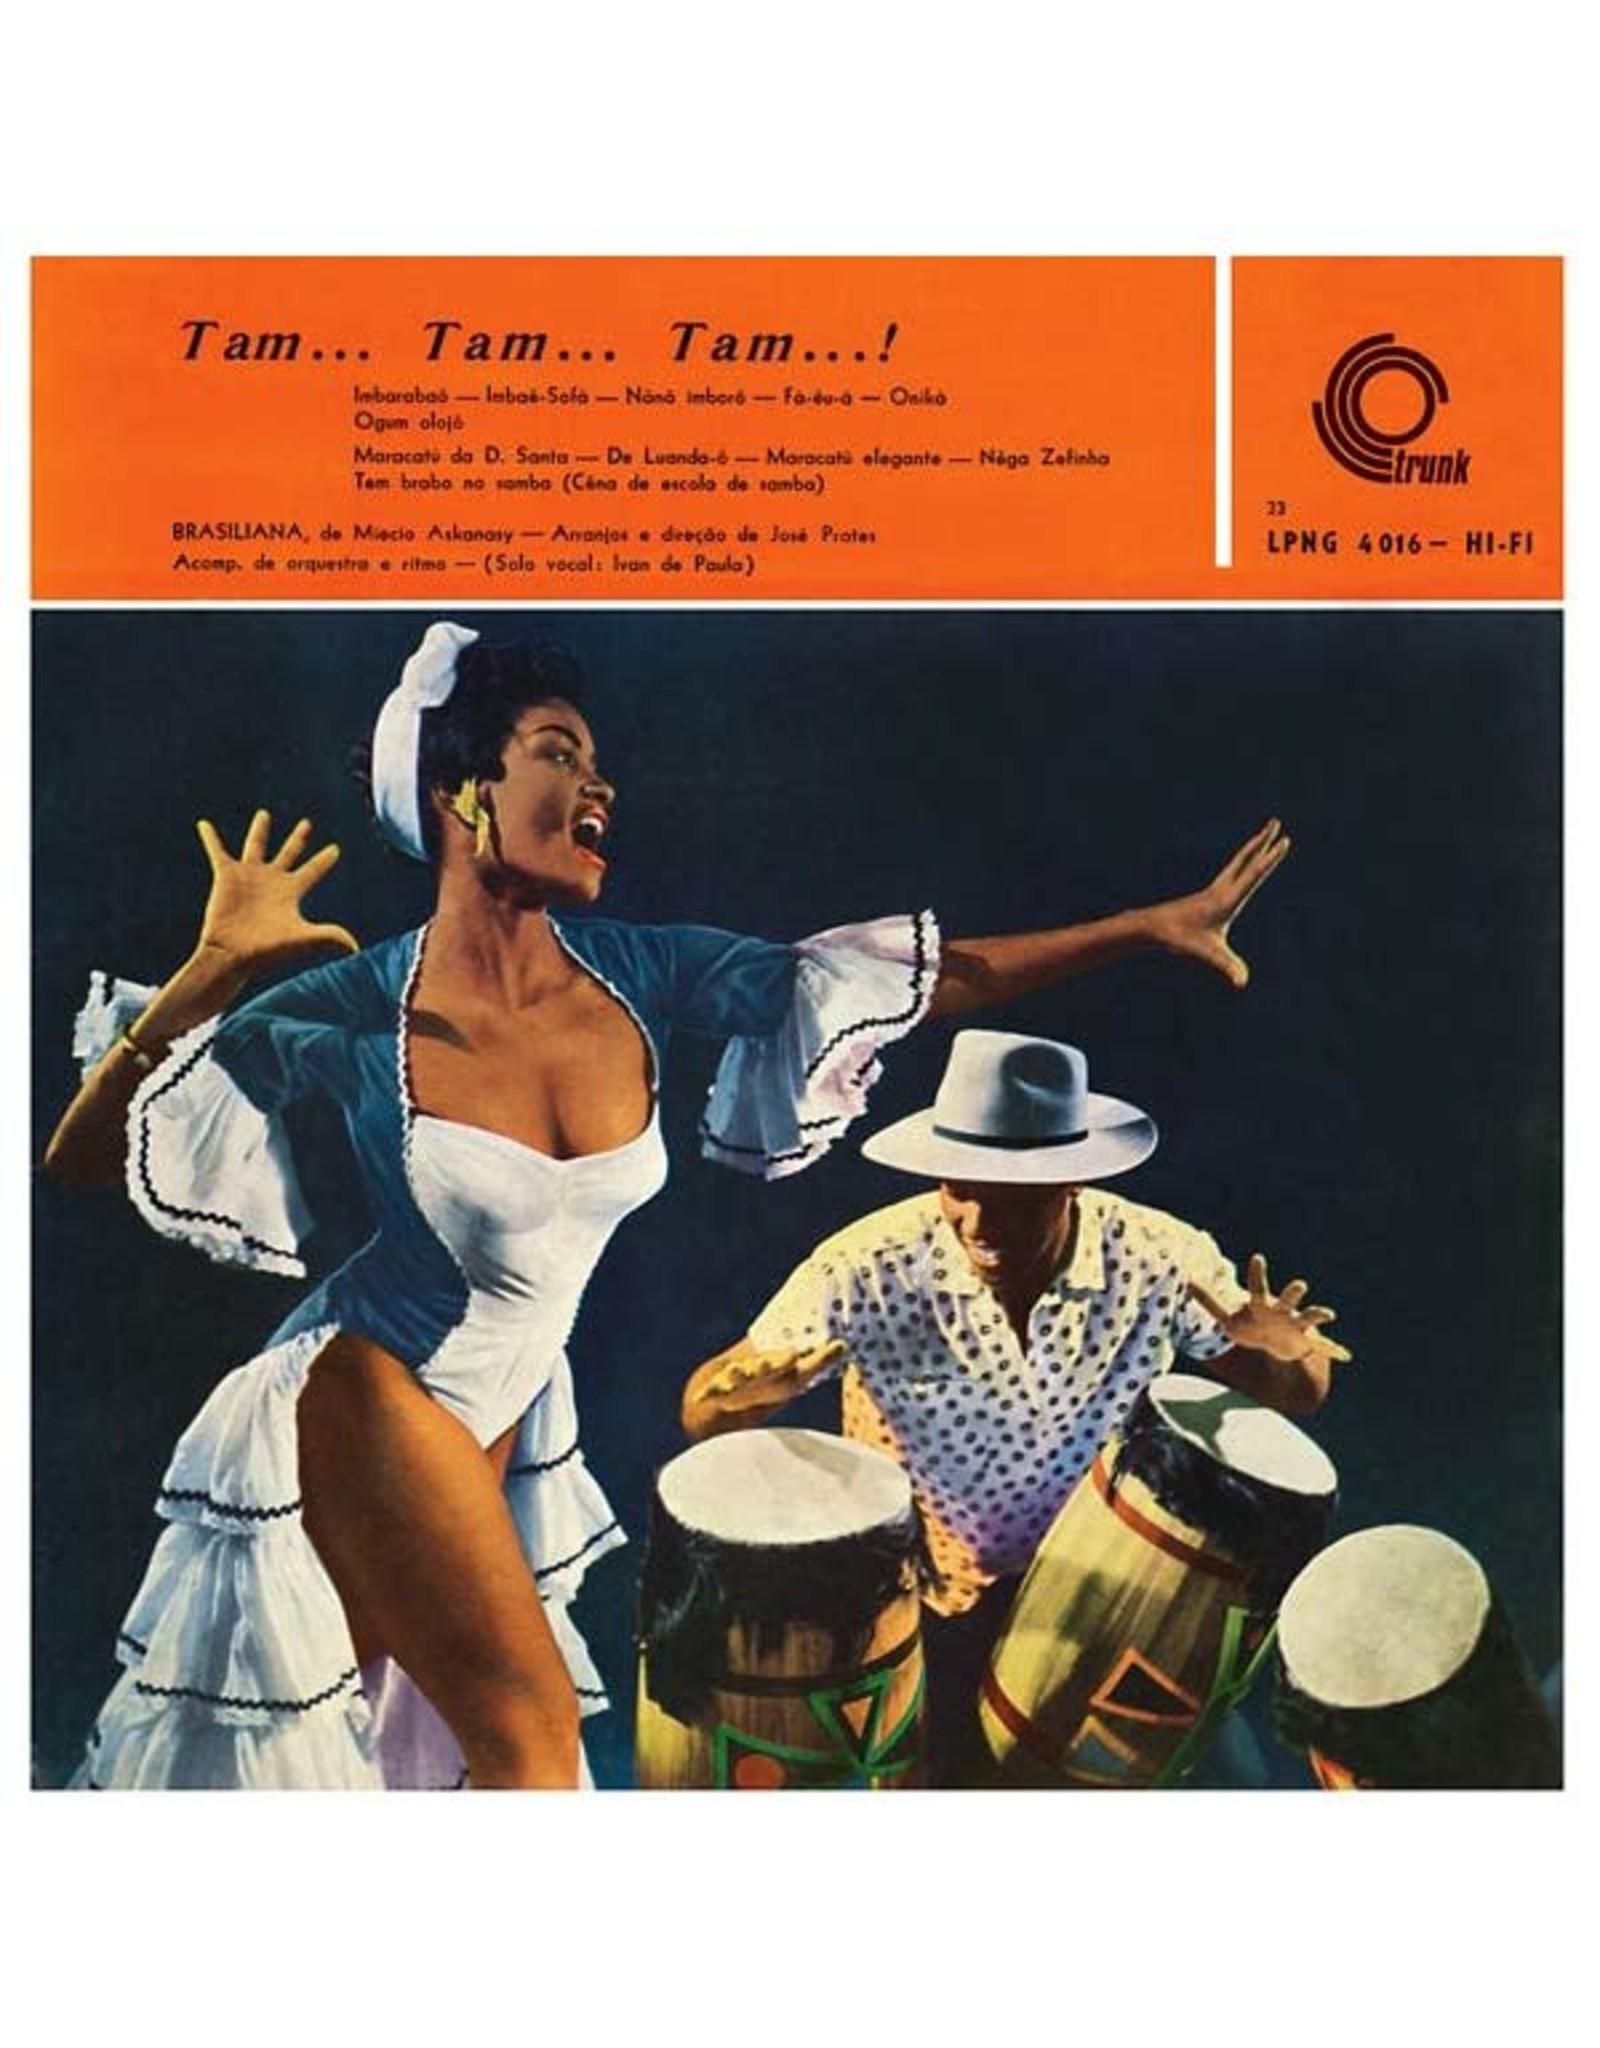 New Vinyl José Prates & Miecio Askanasy - Tam... Tam... Tam...! LP